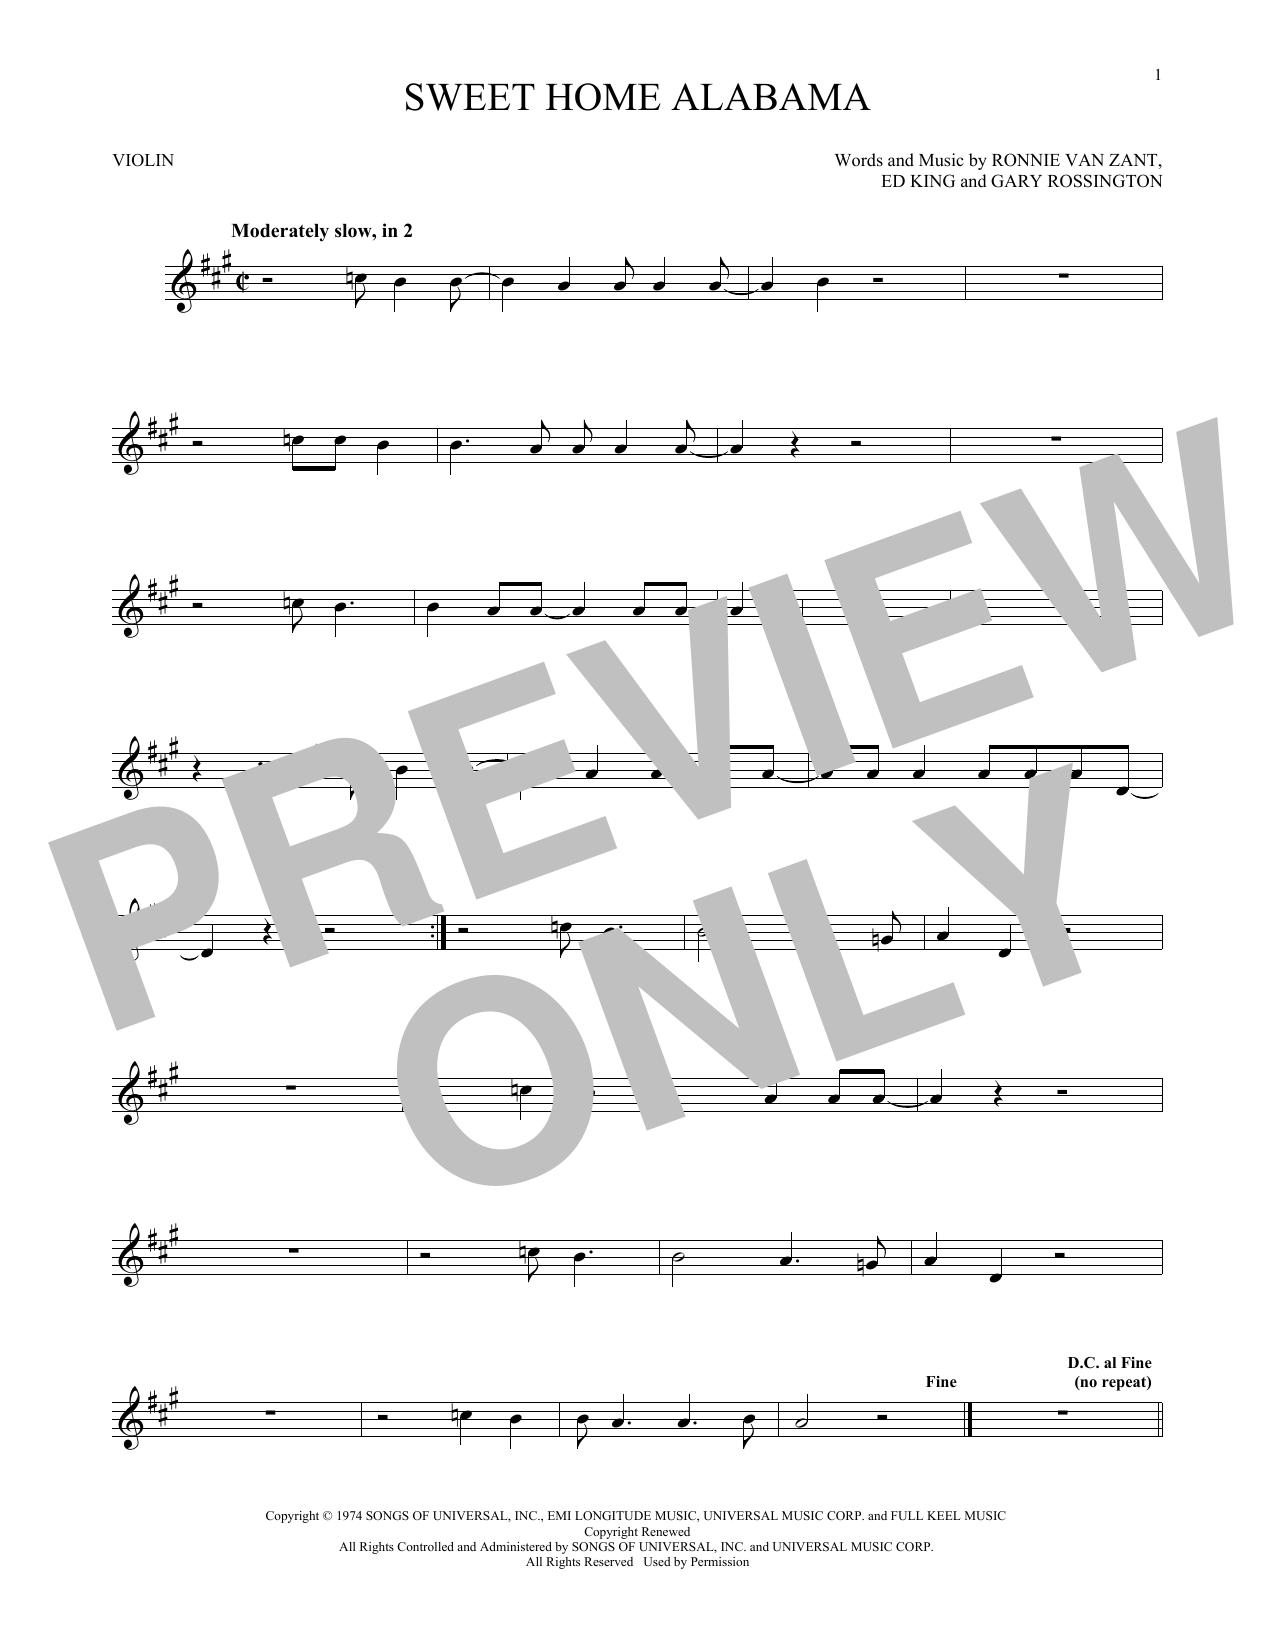 Sheet Music Digital Files To Print Licensed Ed King Digital Sheet